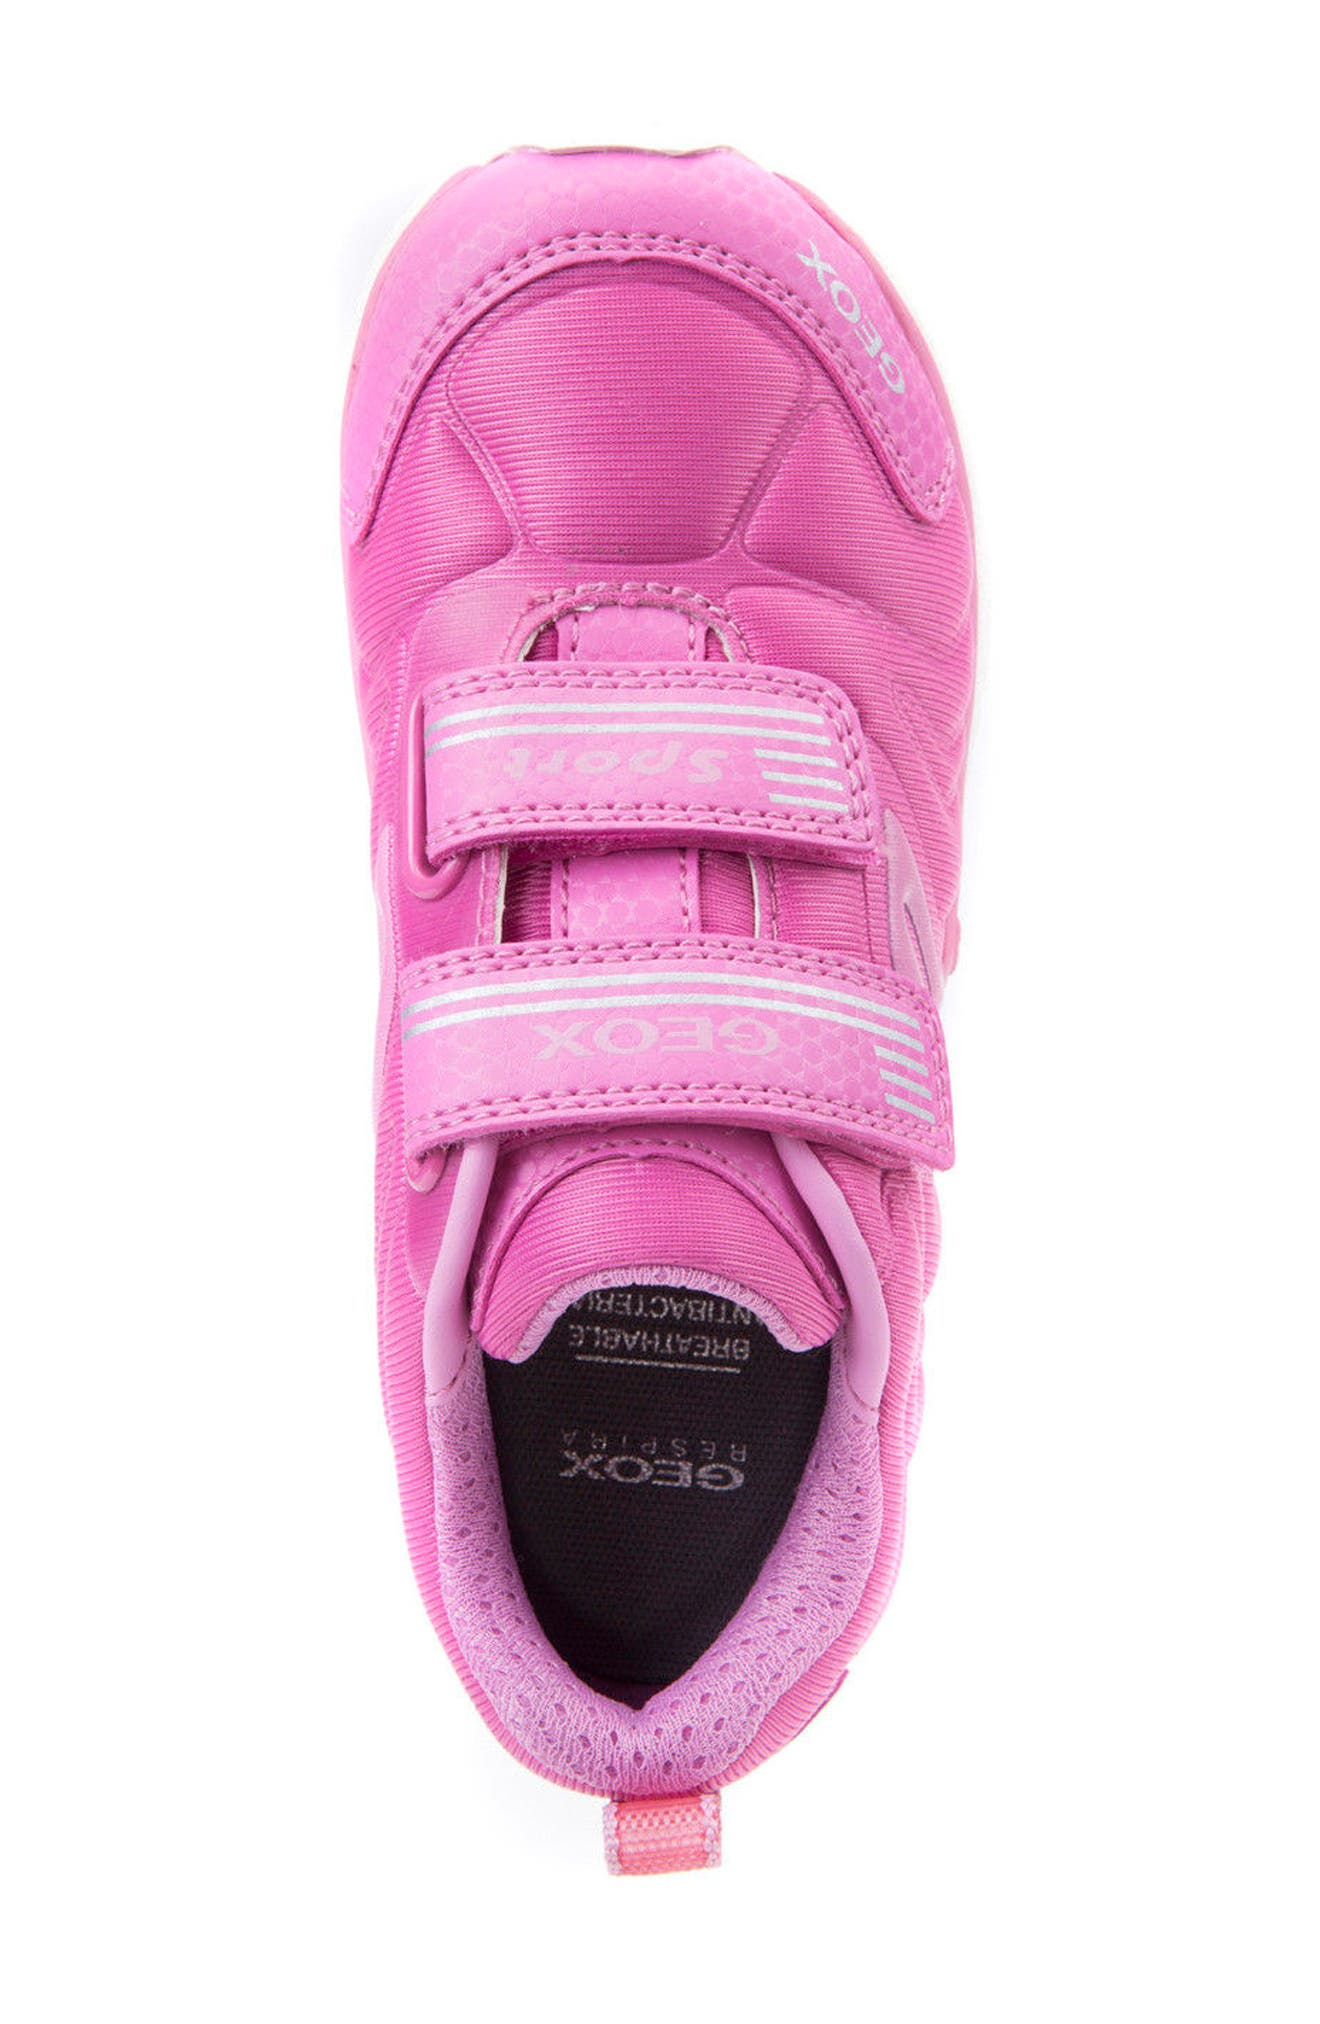 Torque Sneaker,                             Alternate thumbnail 5, color,                             660